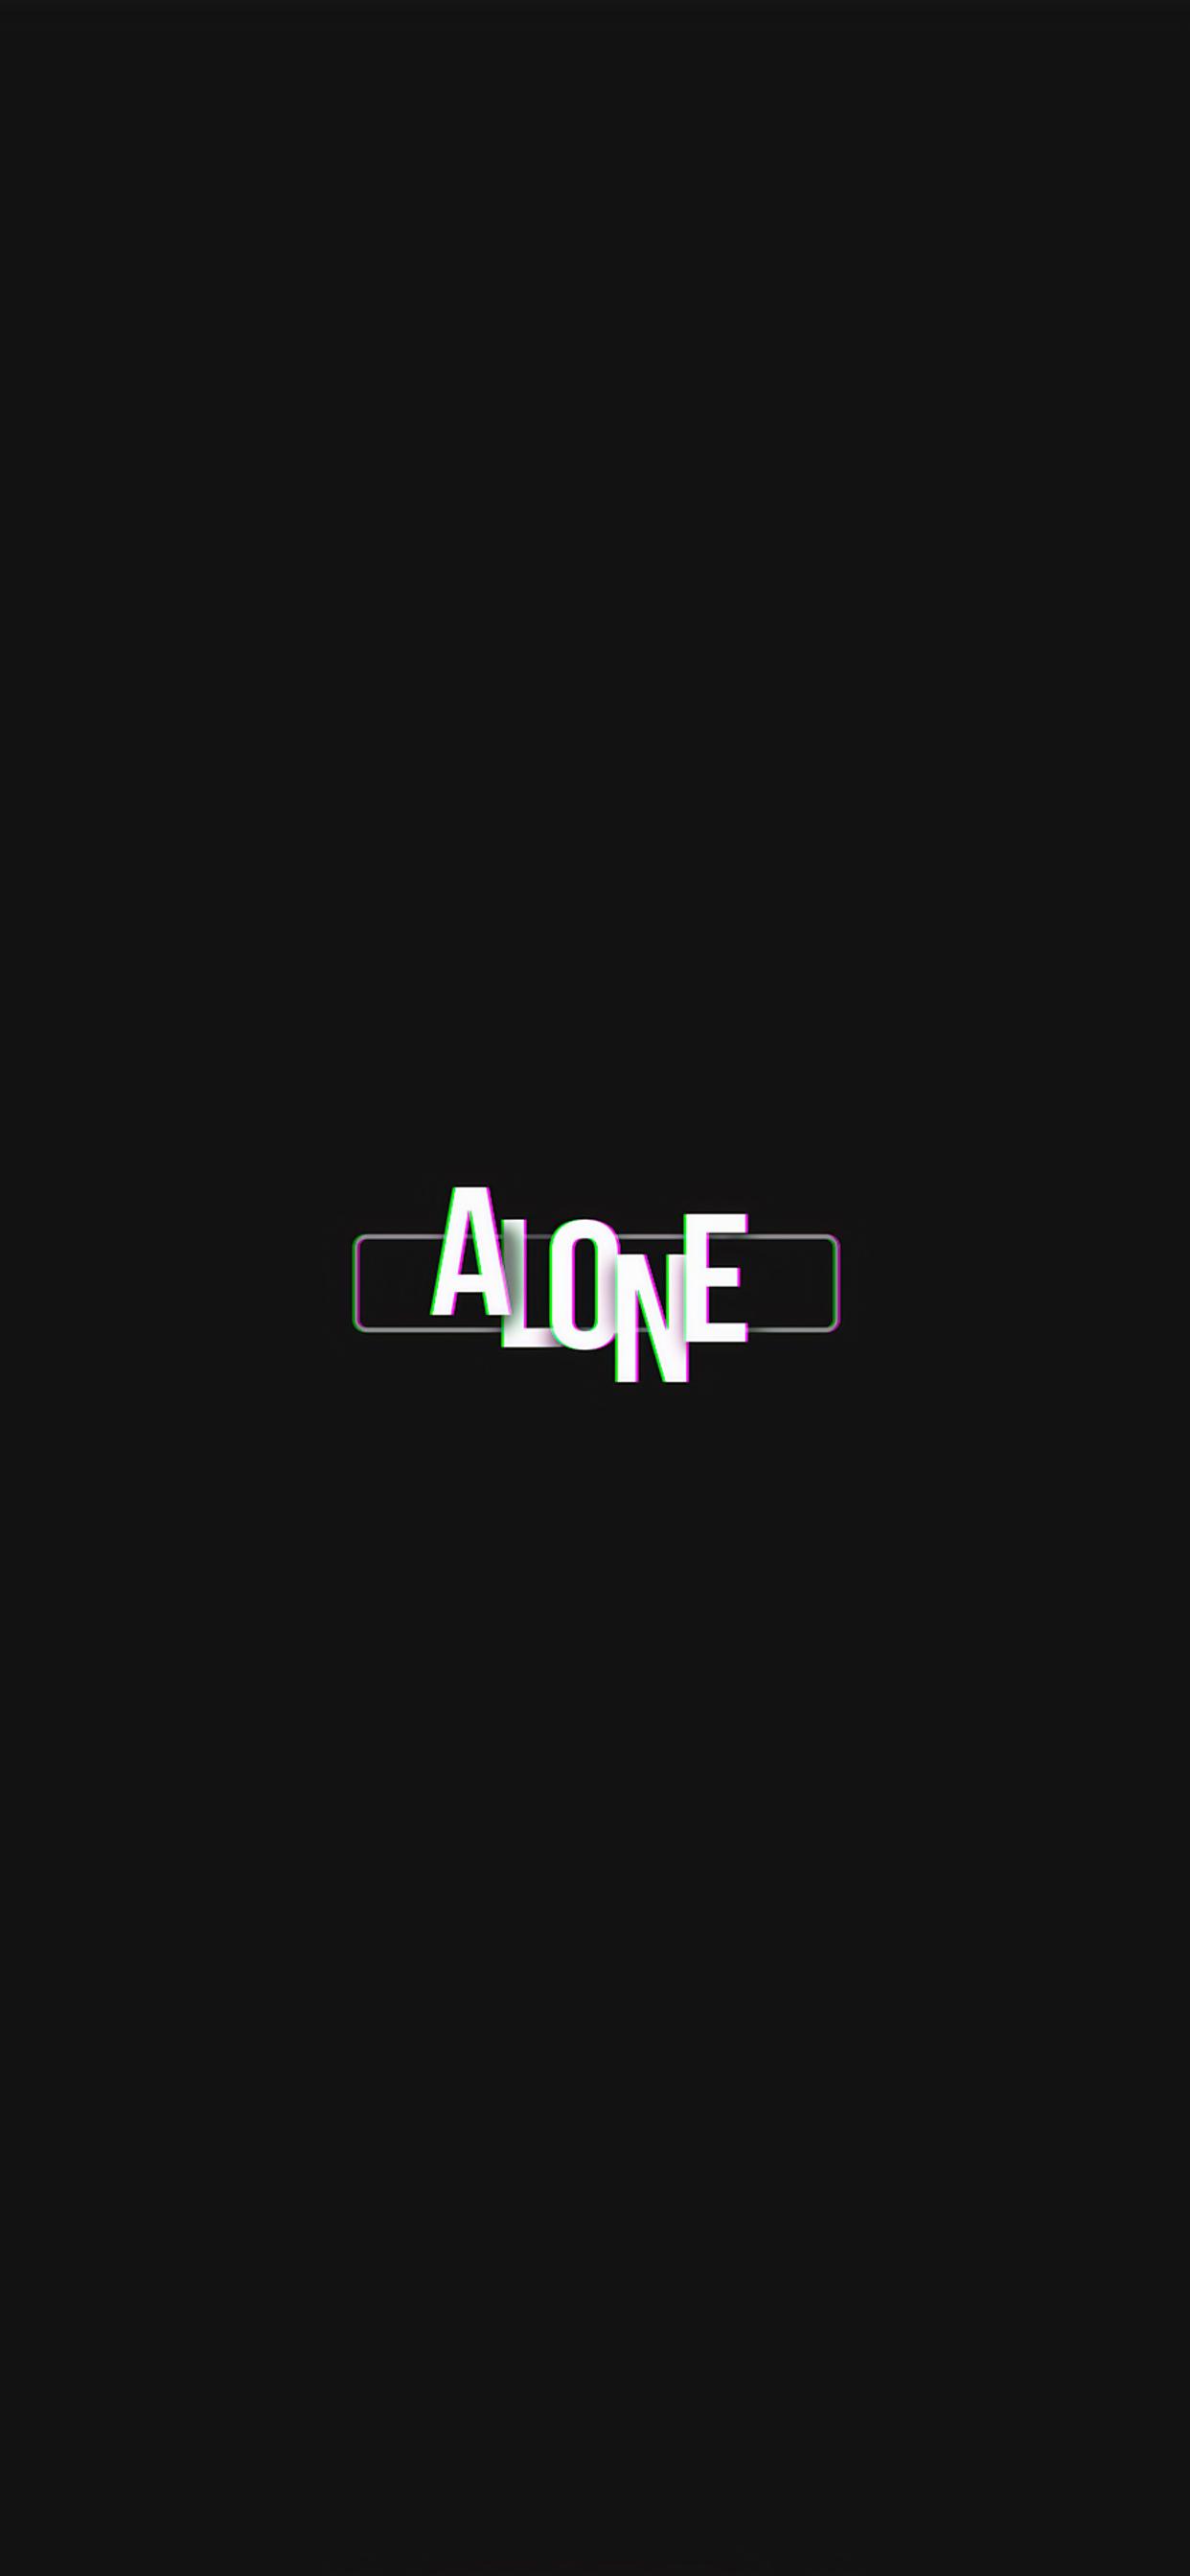 alone-simple-typography-4k-76.jpg